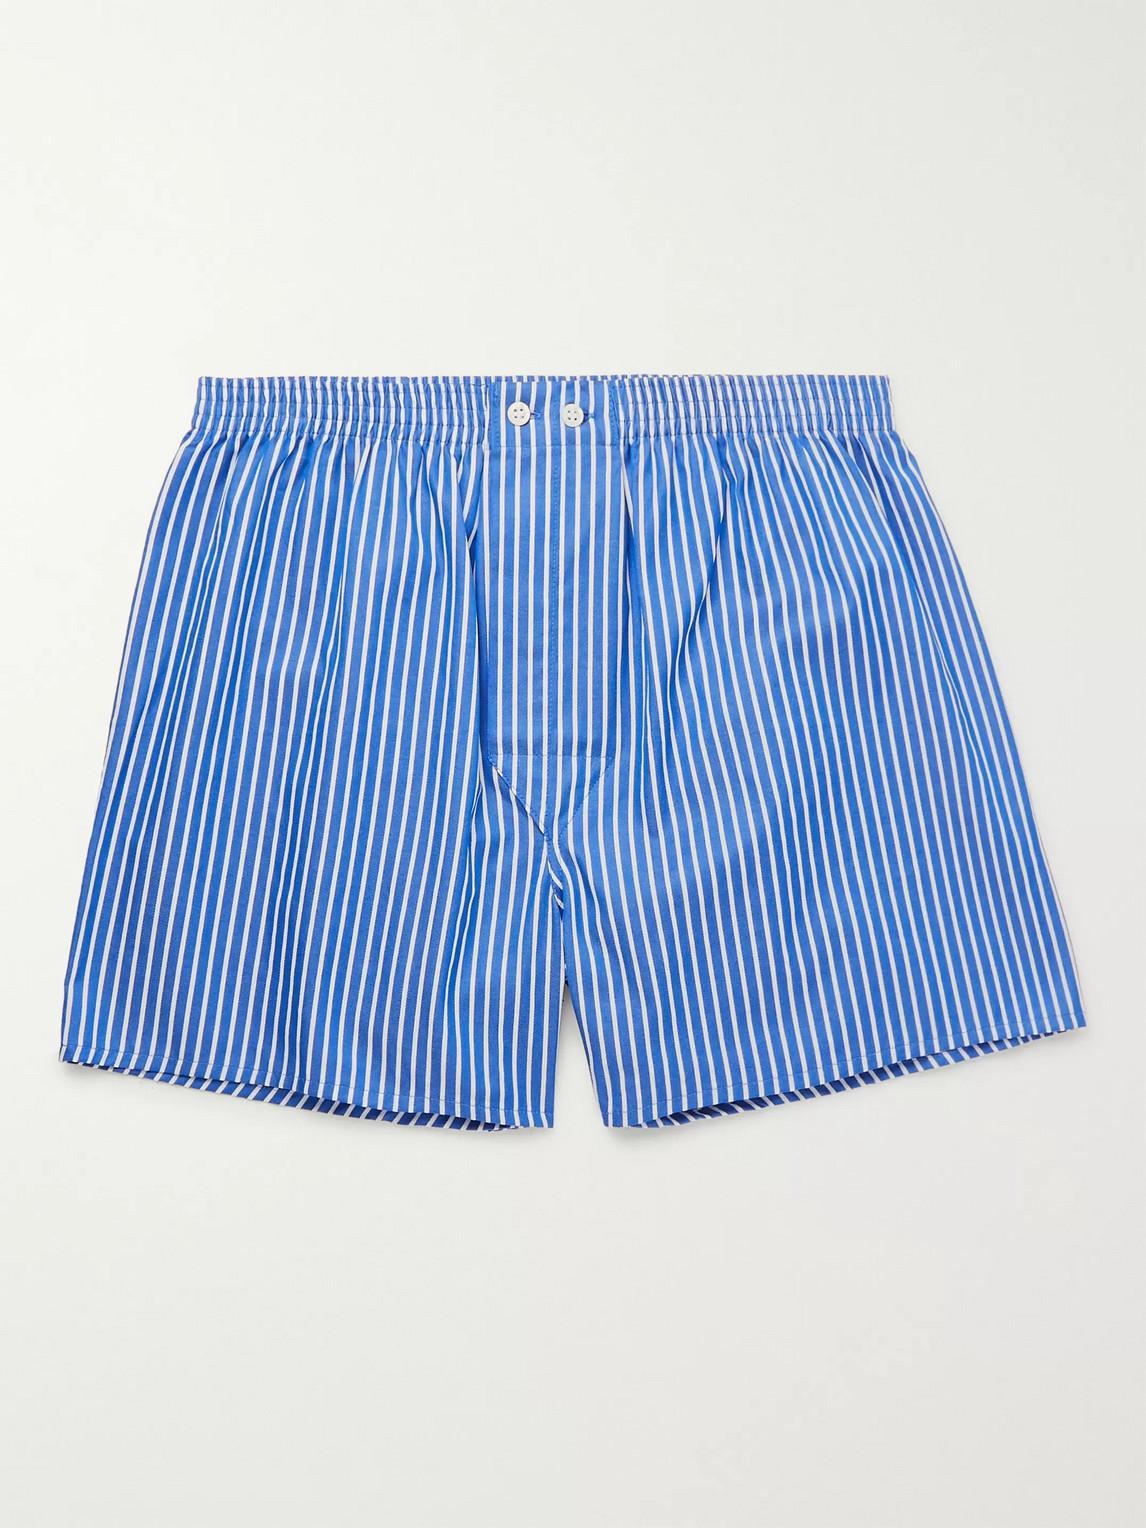 derek rose - royal striped cotton boxer shorts - blue - m - men